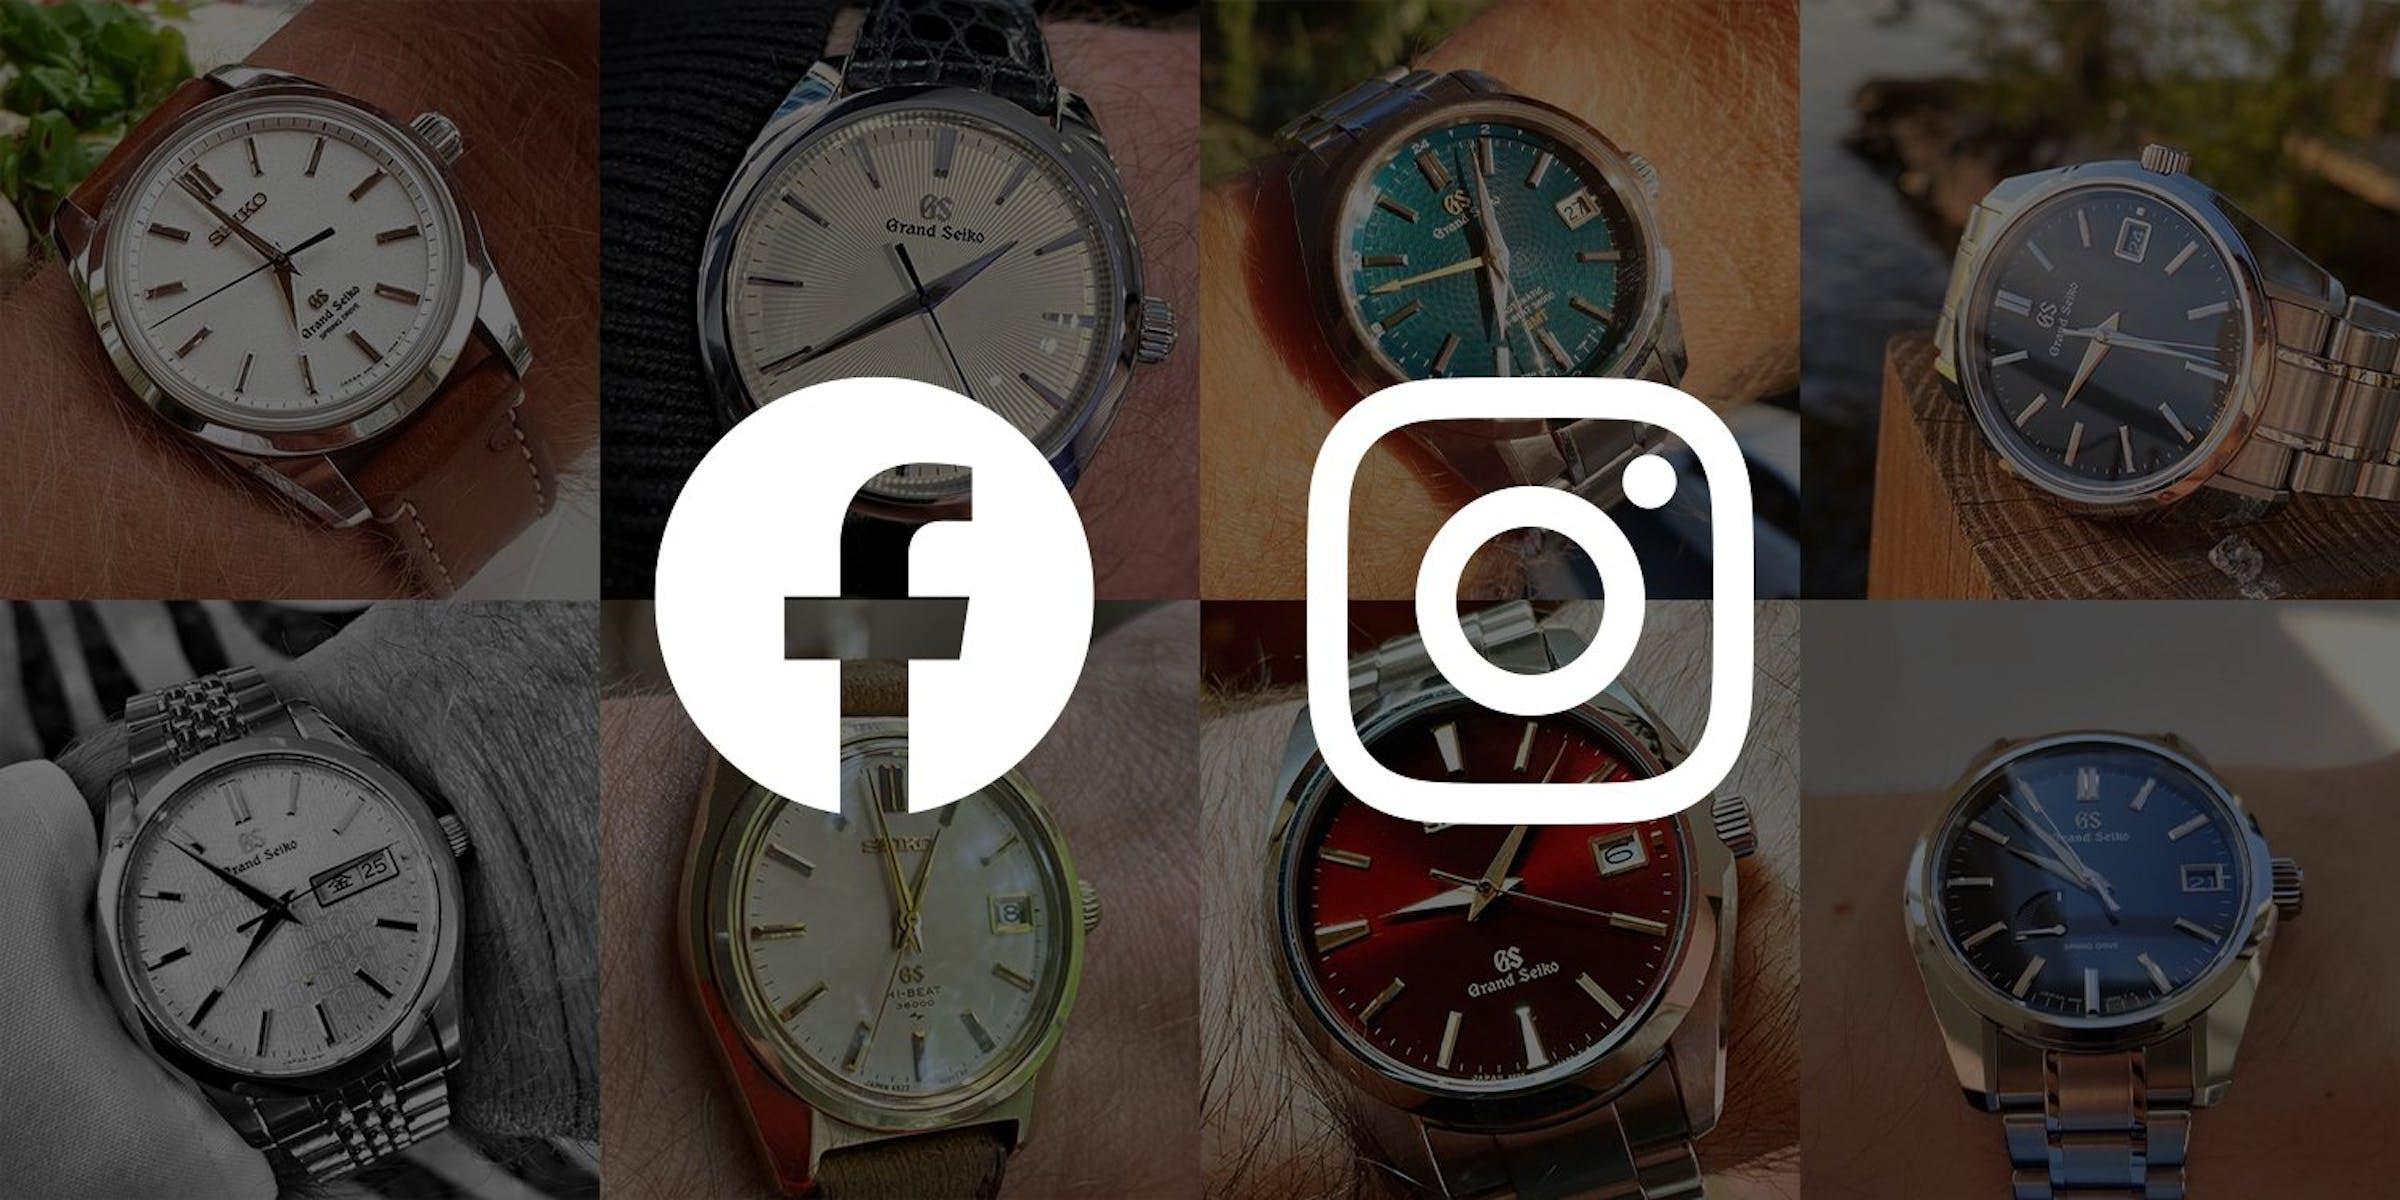 CAM-1231-Grand-Seiko-Brandweek-Wrist-Shot-Gallery-2-1